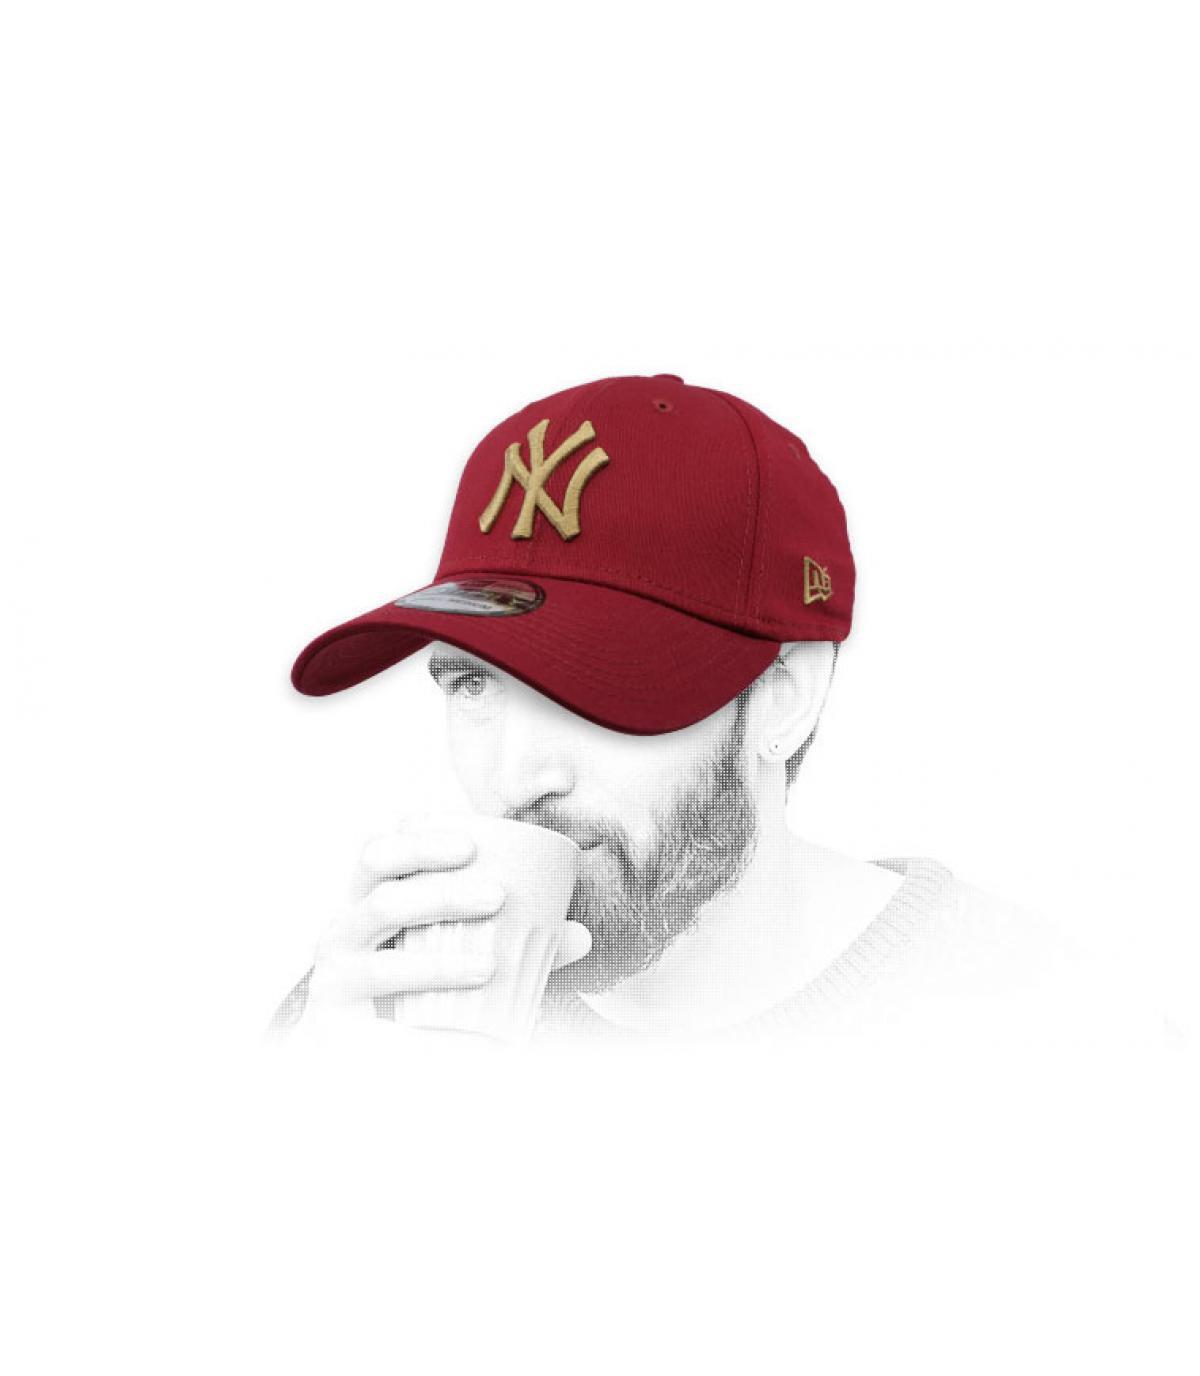 burgundy NY cap